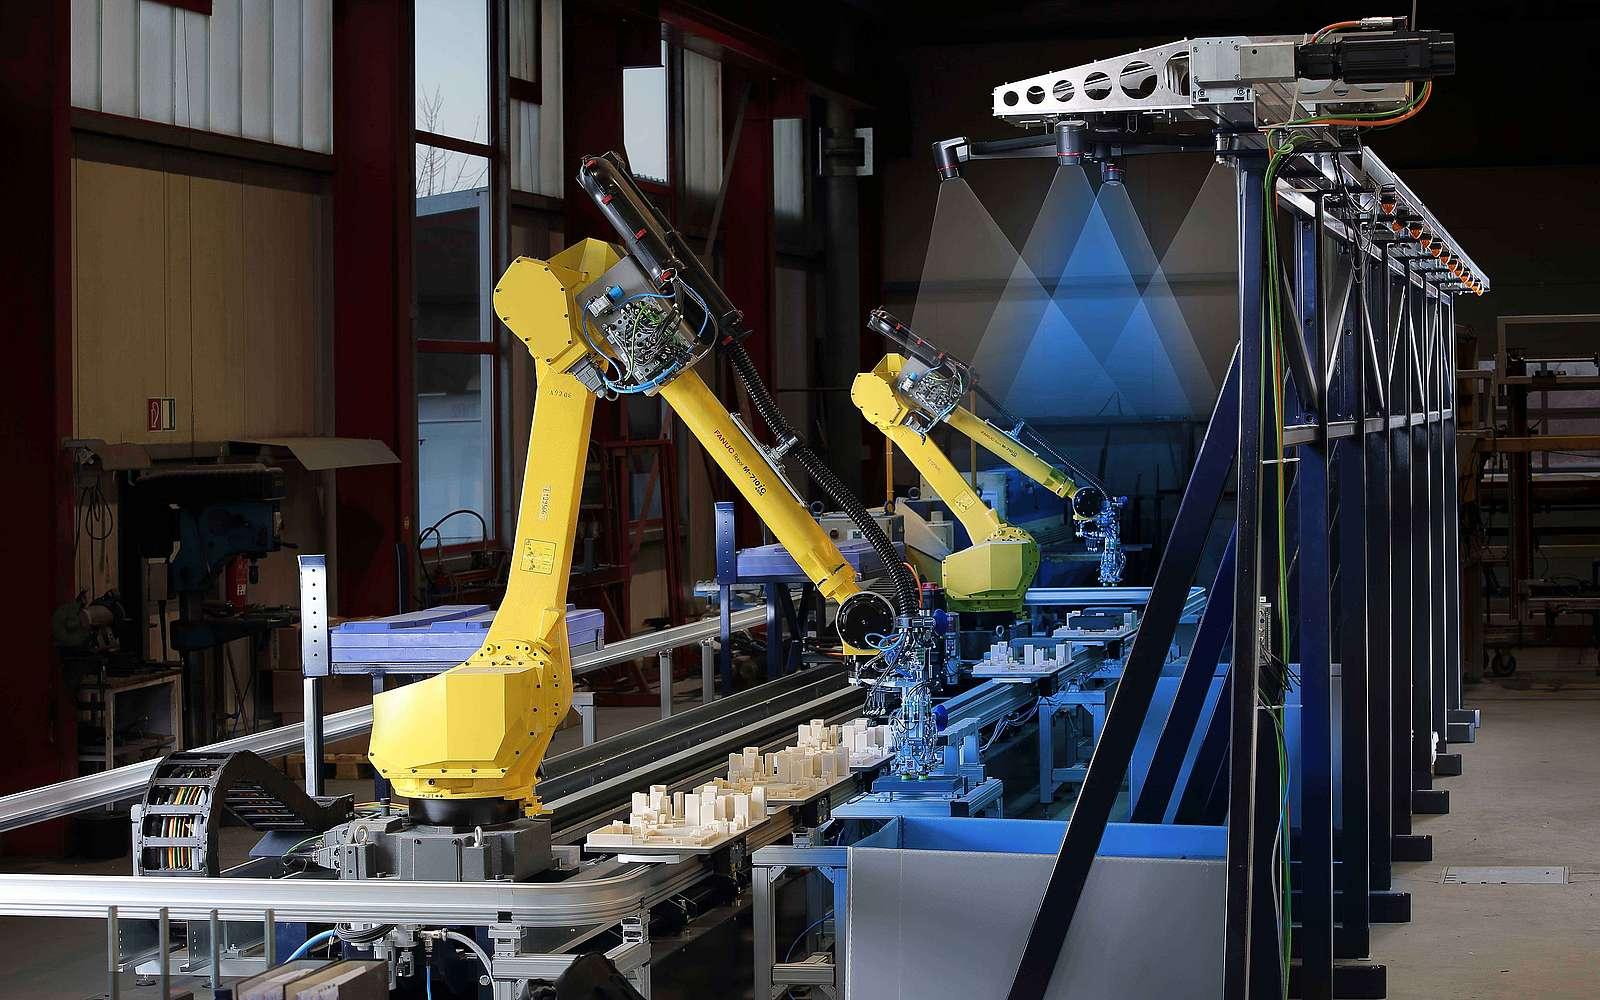 3D Bin Picking mit Keyence 3D Vision Kamera in Roboterzelle